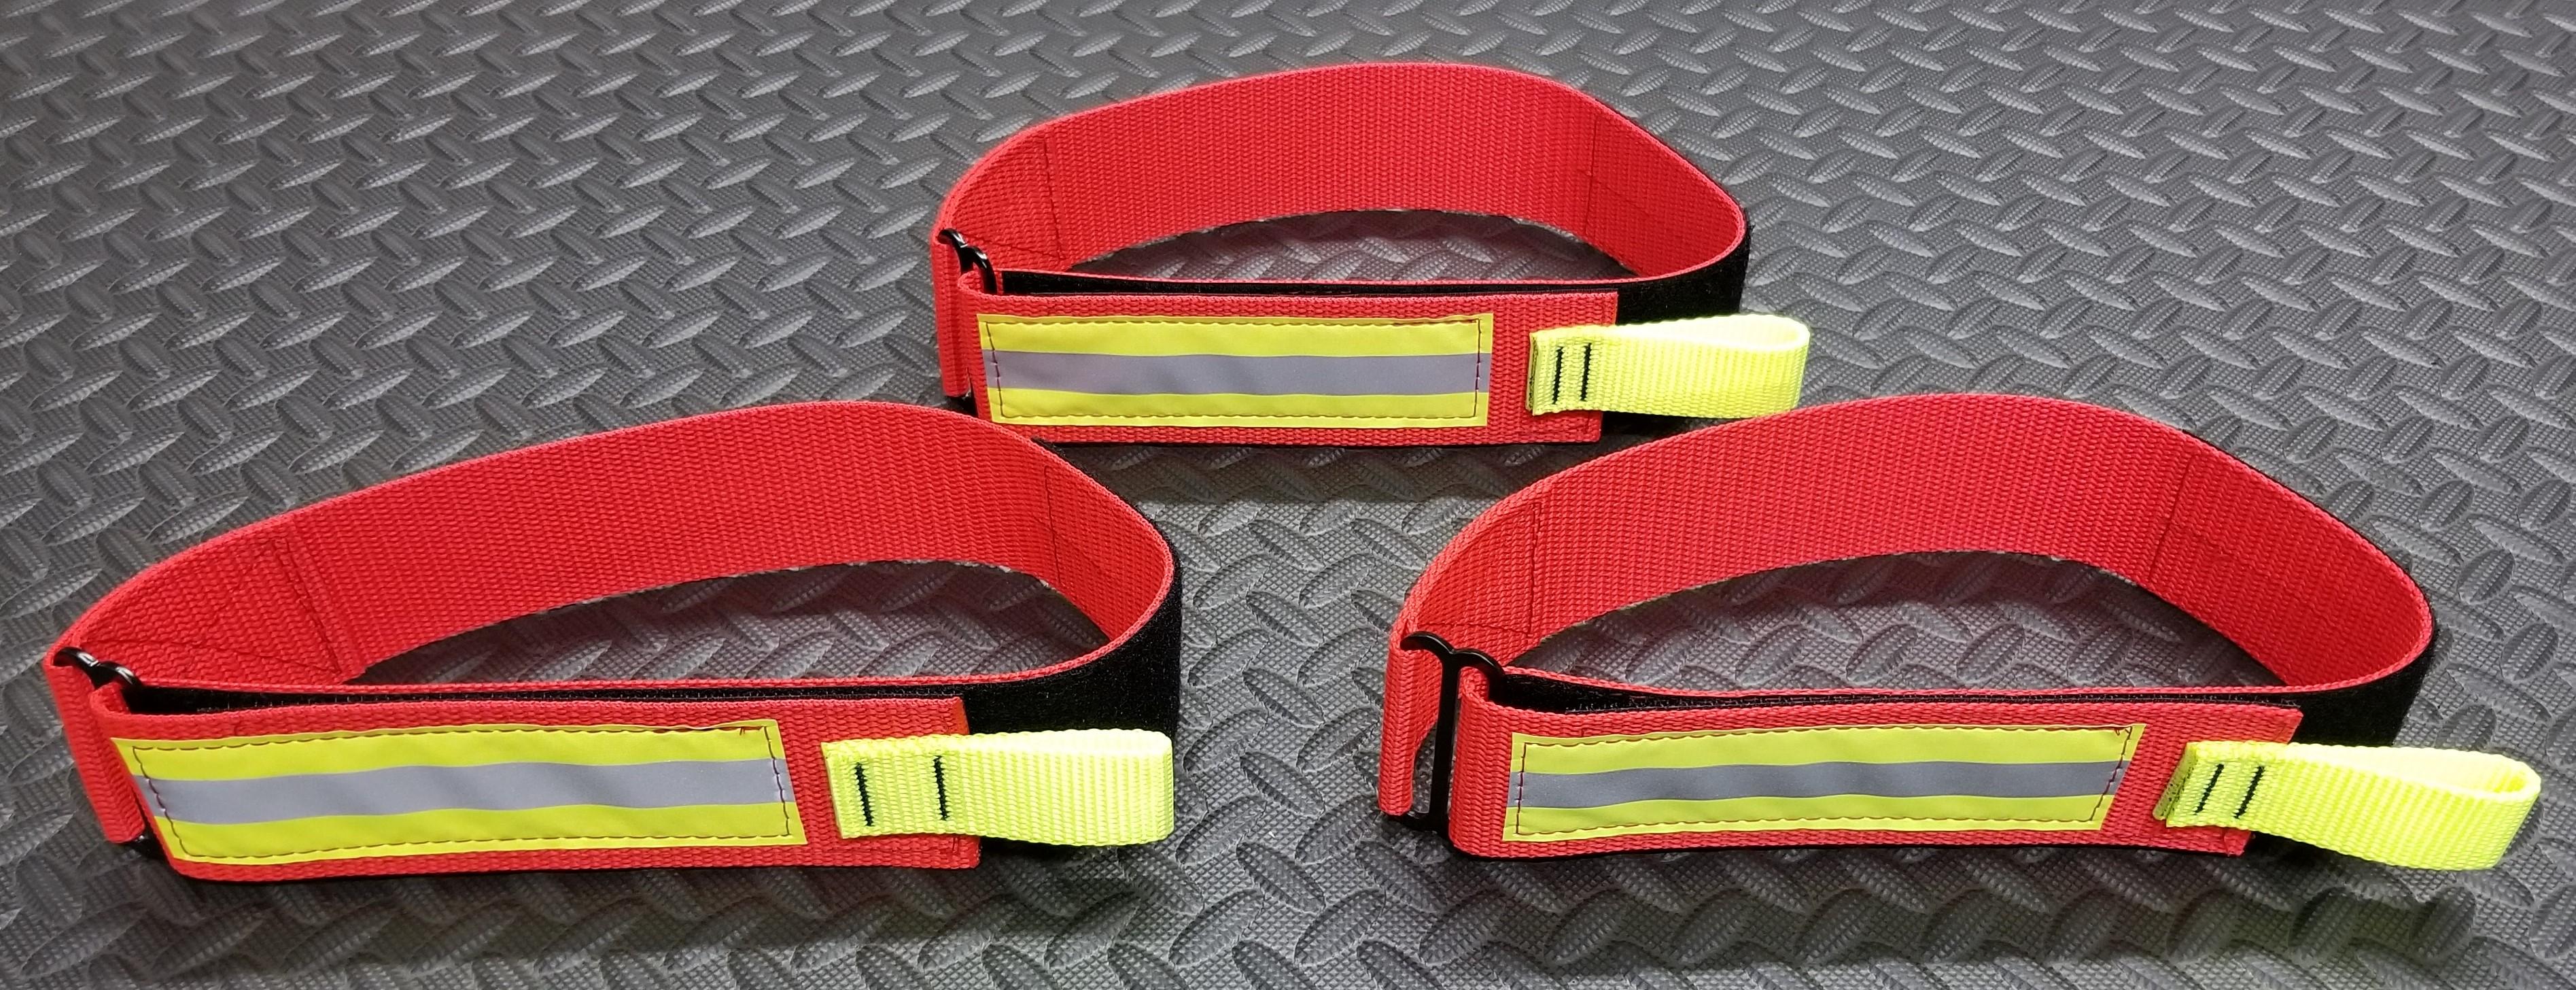 Nylon Webbing 6,000 lb 6 ft Red Firefighter Rescue Strap Sav-A-Jake